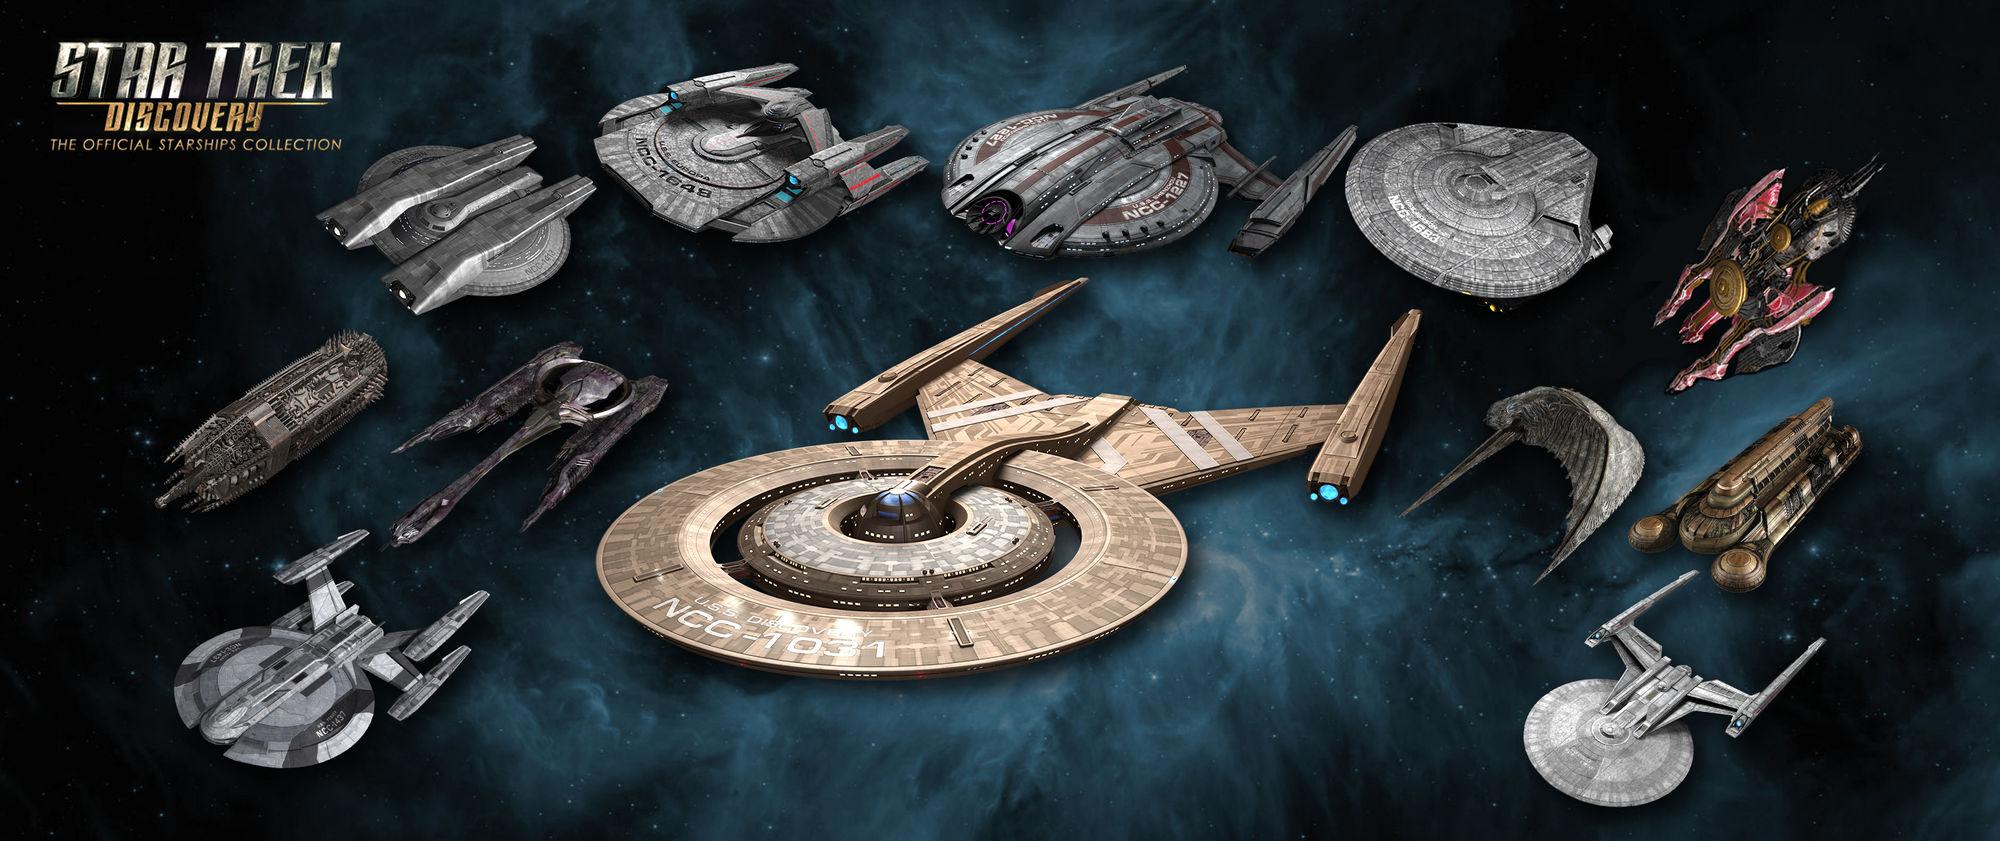 Eaglemoss_Star_Trek_Discovery_Official_Starships_Collection_promo.jpg